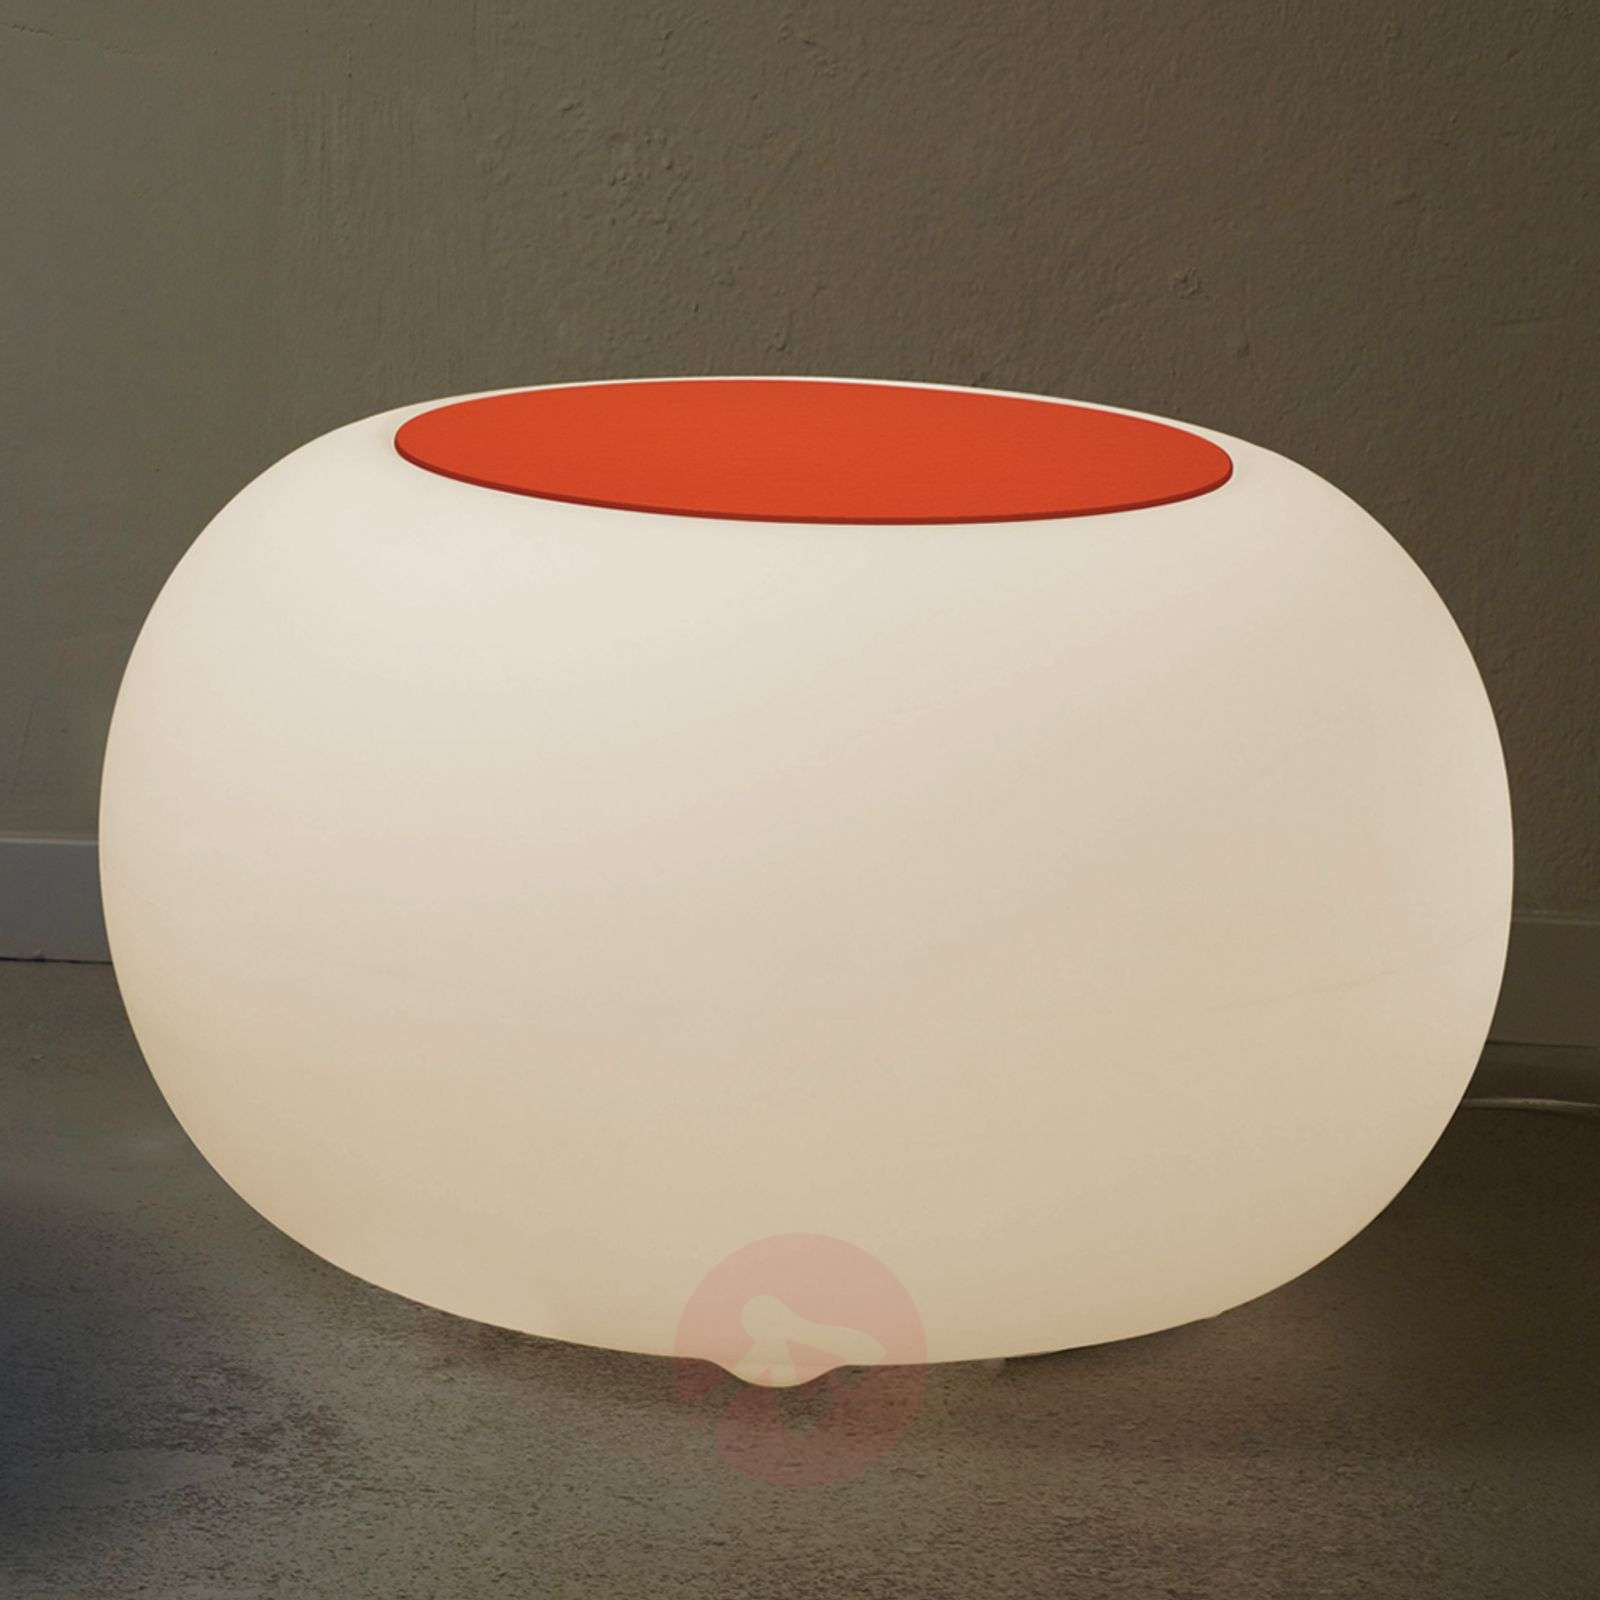 Bubble LED BATTERY Outdoor Table orange felt cover-6537084-01